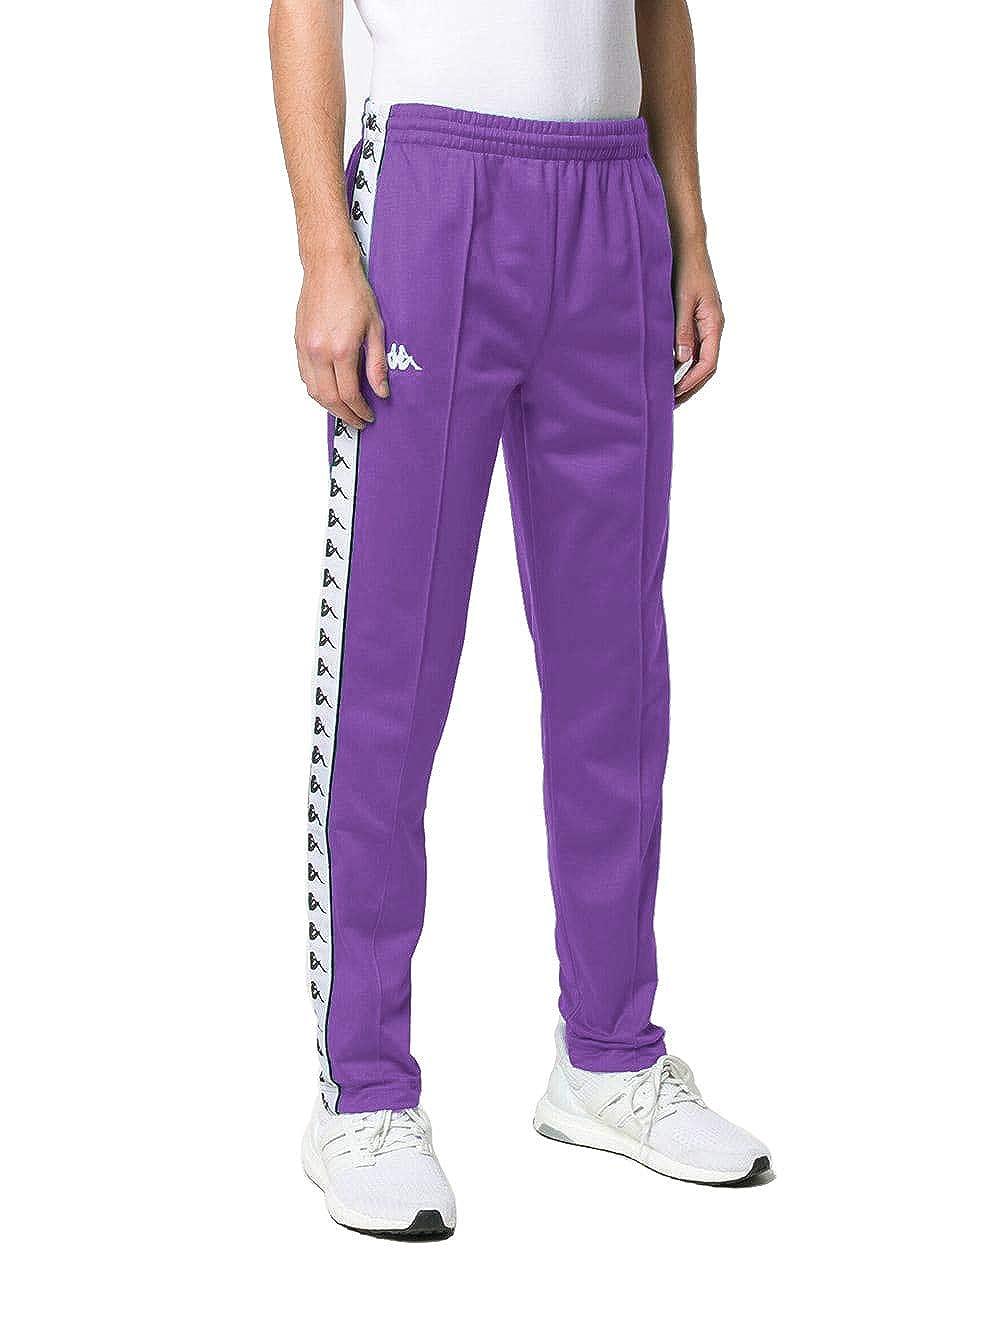 457c971461 Kappa Banda ASTORIAZZ Side Logo Slim Track Pants, Violet ($70-Now $59) at  Amazon Men's Clothing store: